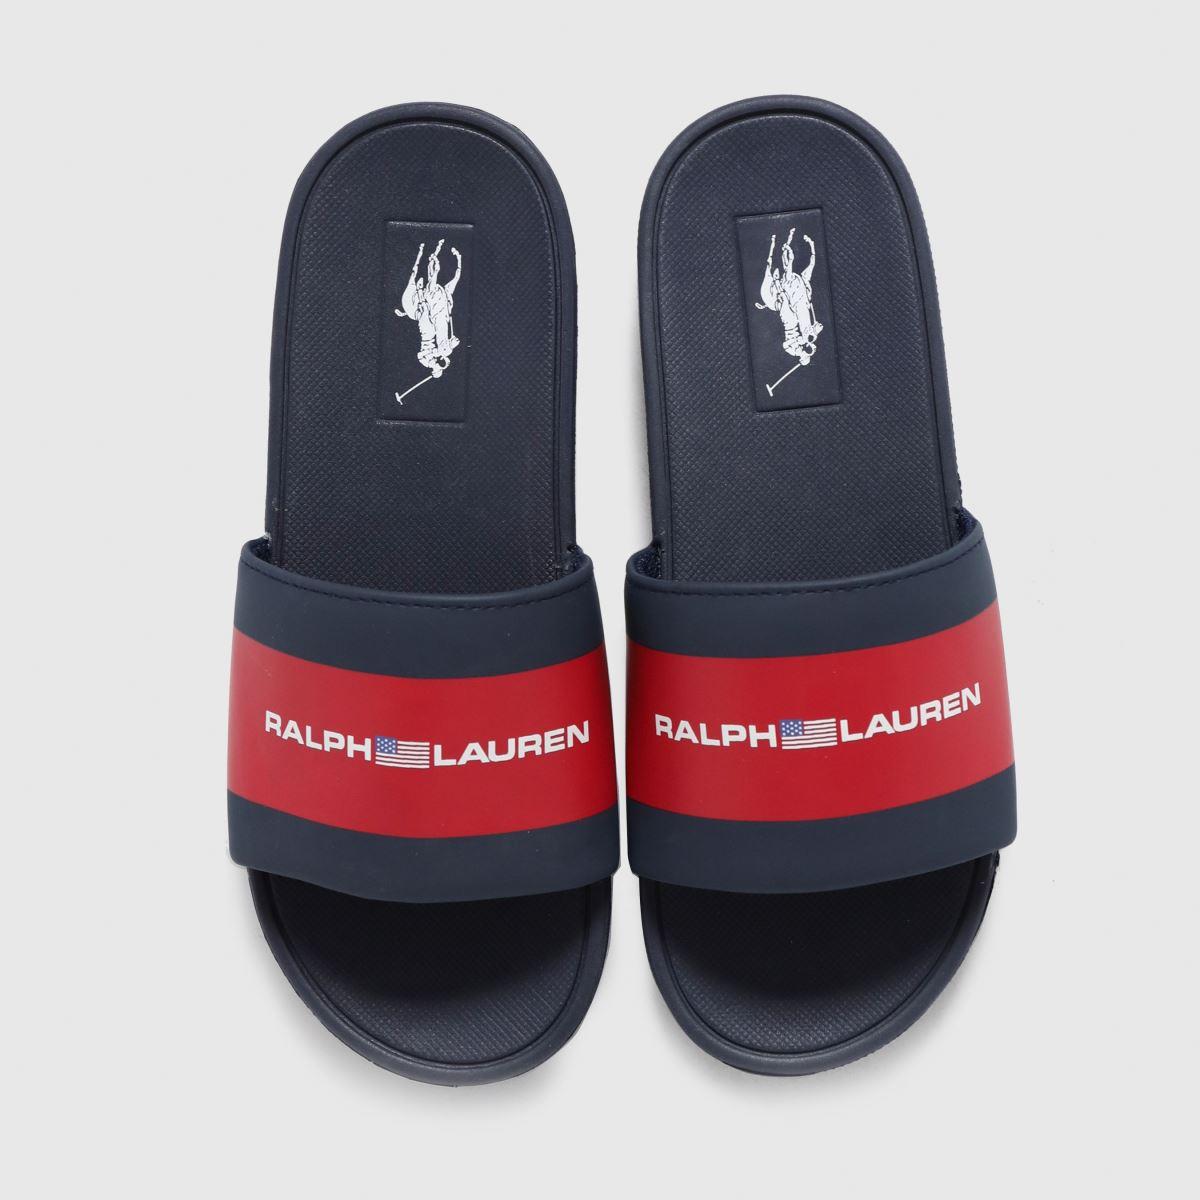 Polo Ralph Lauren Navy & Red Bensley Iii Sliders Youth